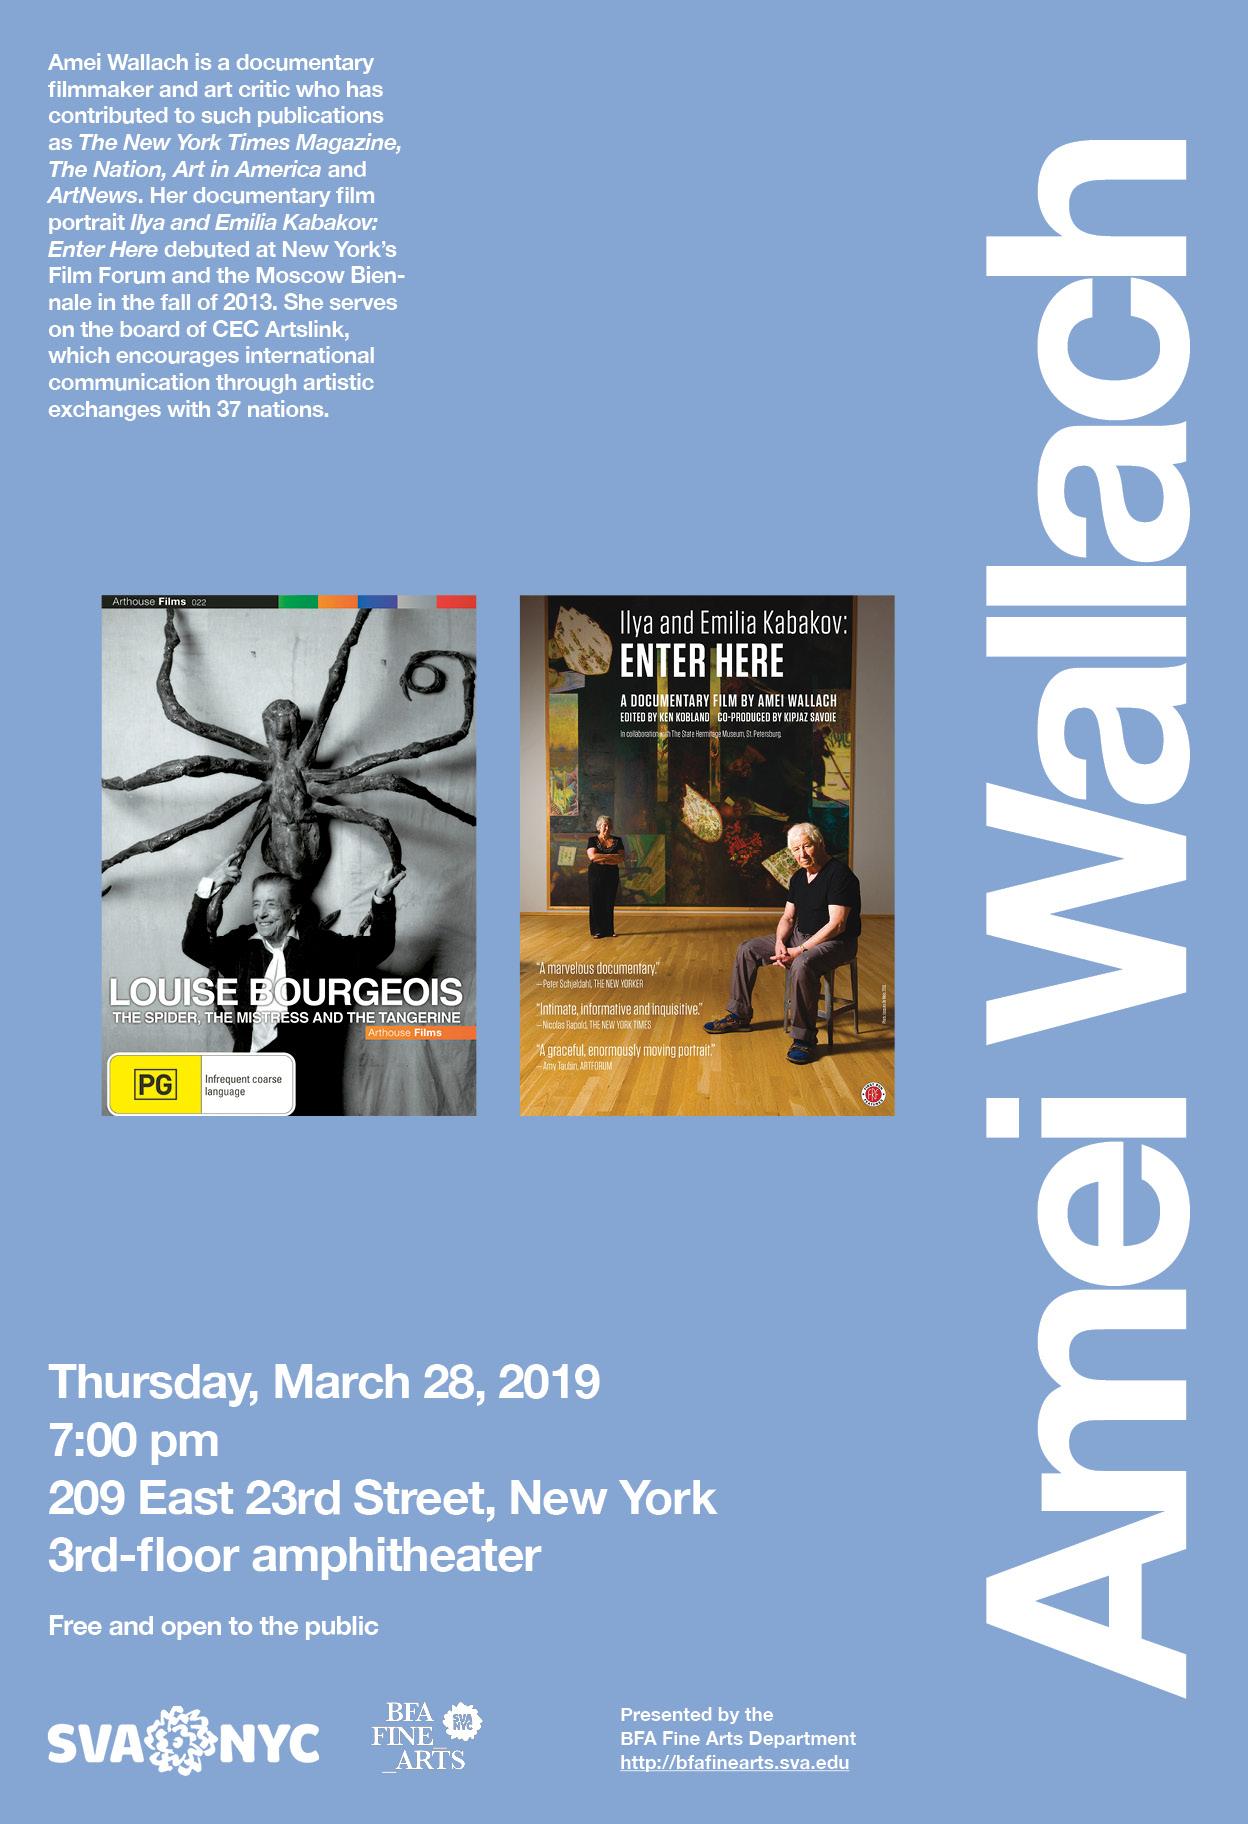 Amei Wallach Lecture - Events - BFA Fine Arts Department